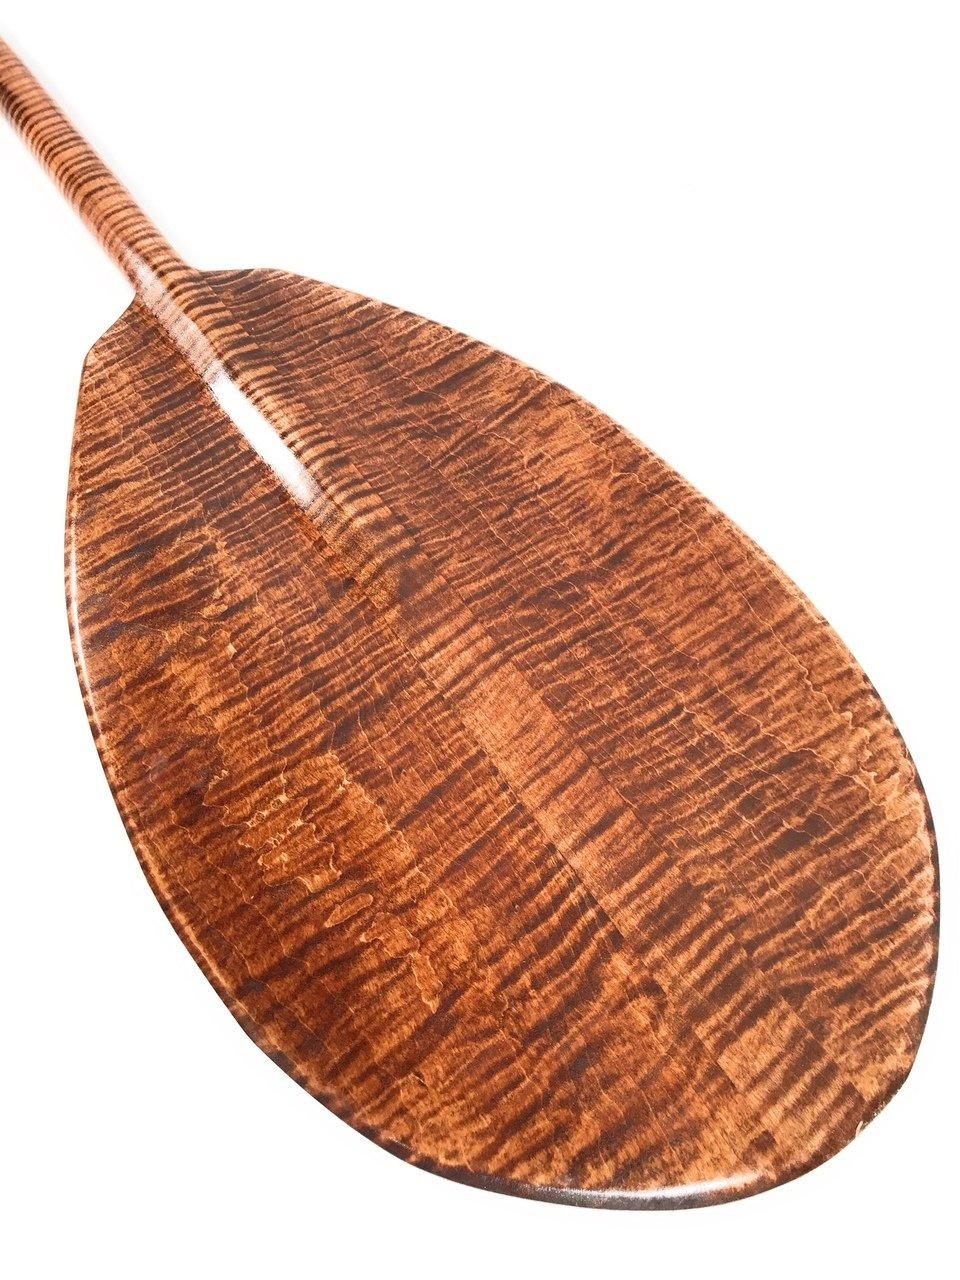 Decorative Hawaiian Outrigger Paddle 50'' w/ T Handle - Maple | #koa6077